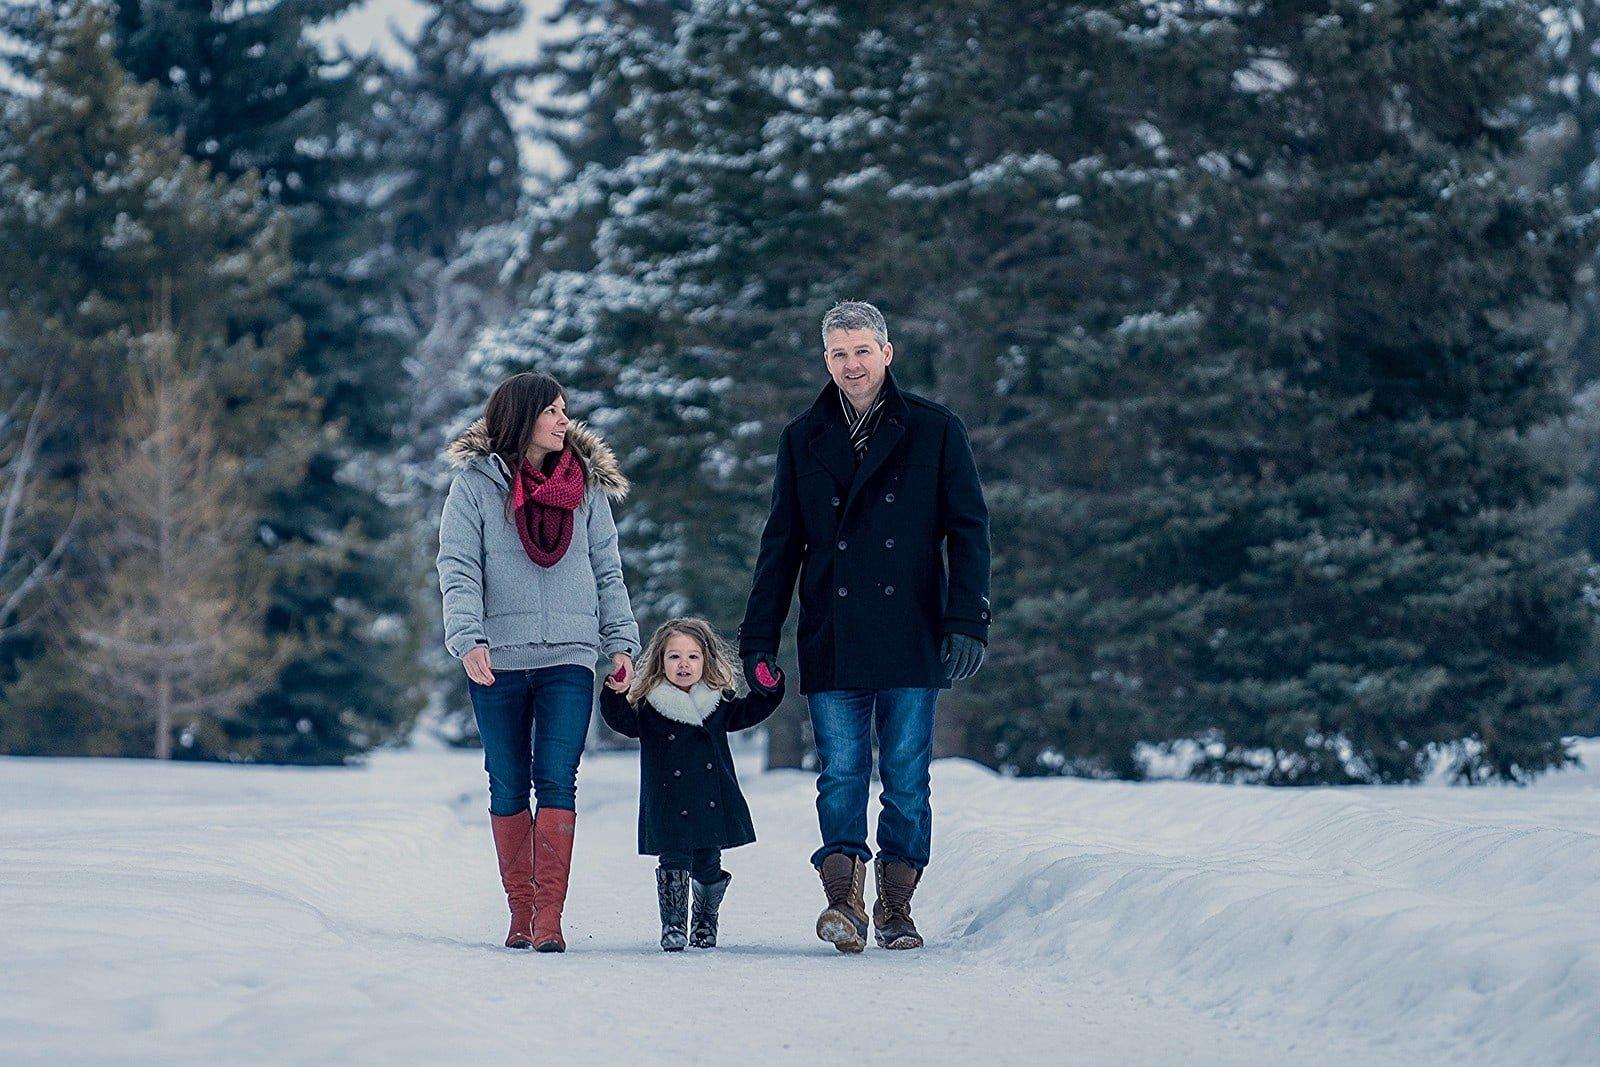 Wintery family walk portrait